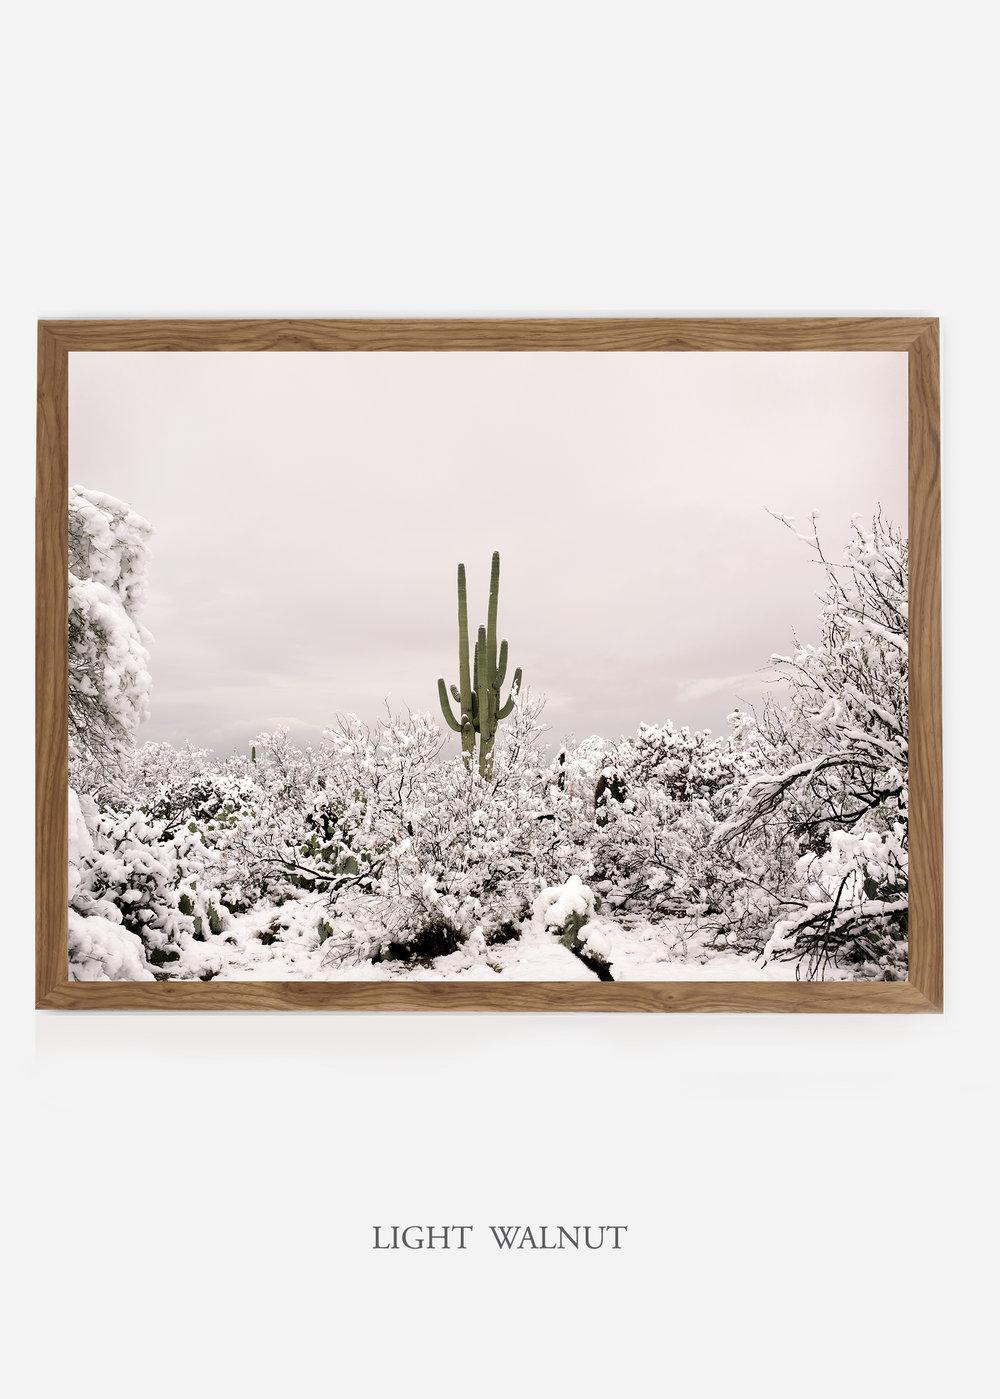 nomat_lightwalnutframe-saguaroNo.1-wildercalifornia-art-wallart-cactusprint-homedecor-prints-arizona-botanical-artwork-interiordesign.jpg